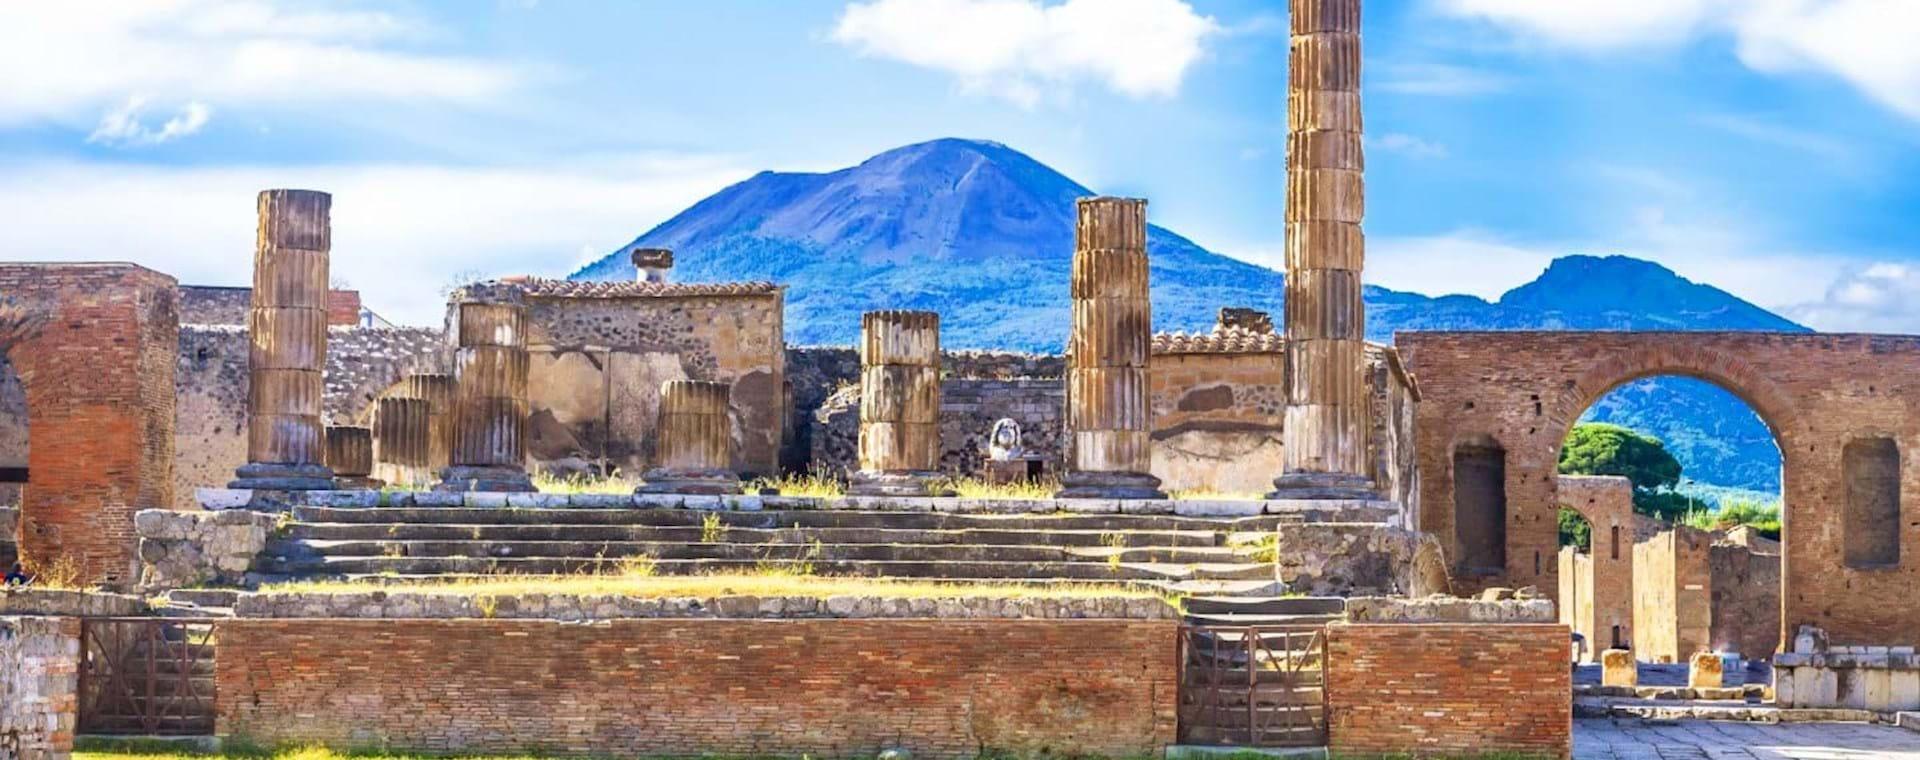 Full Day Pompeii Tour from Rome with Mt. Vesuvius Volcano